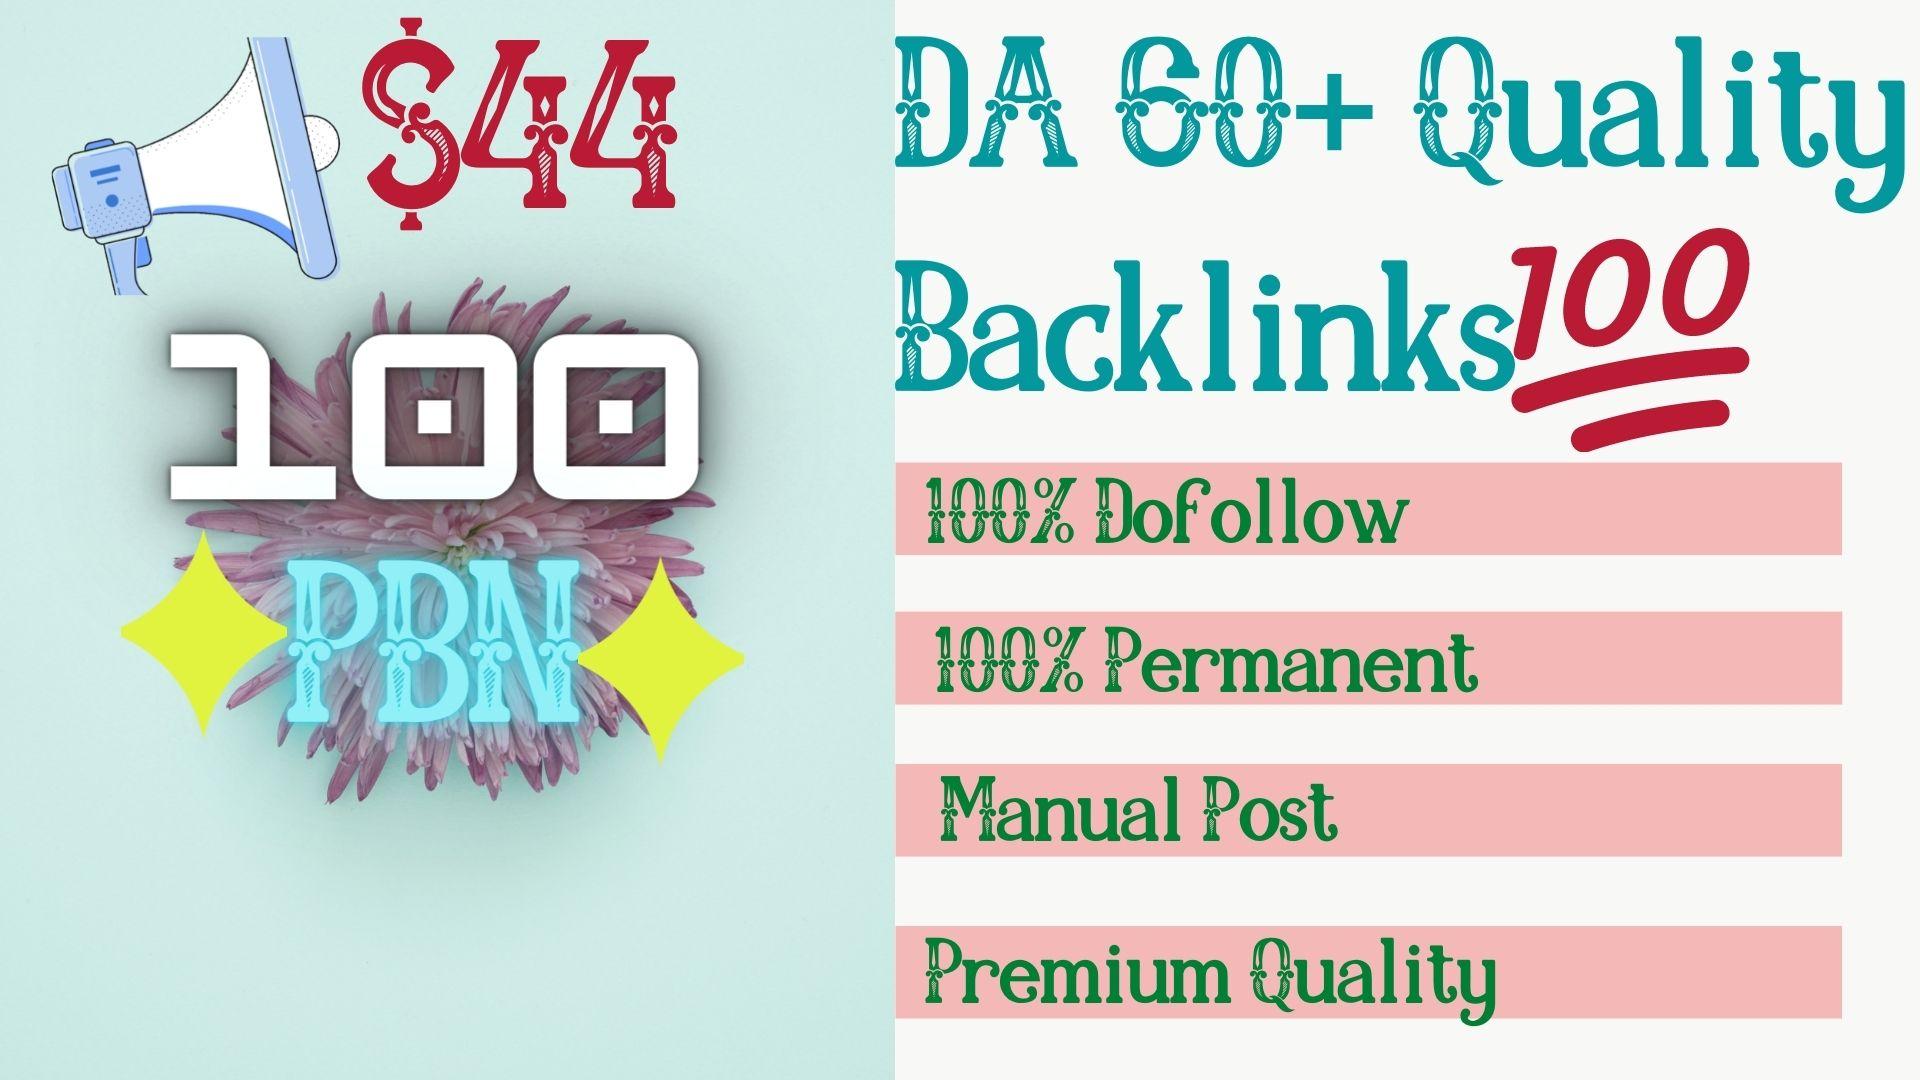 Get 100 High Quality DA 65+ Permanent Quality Dofollow PBN Links.